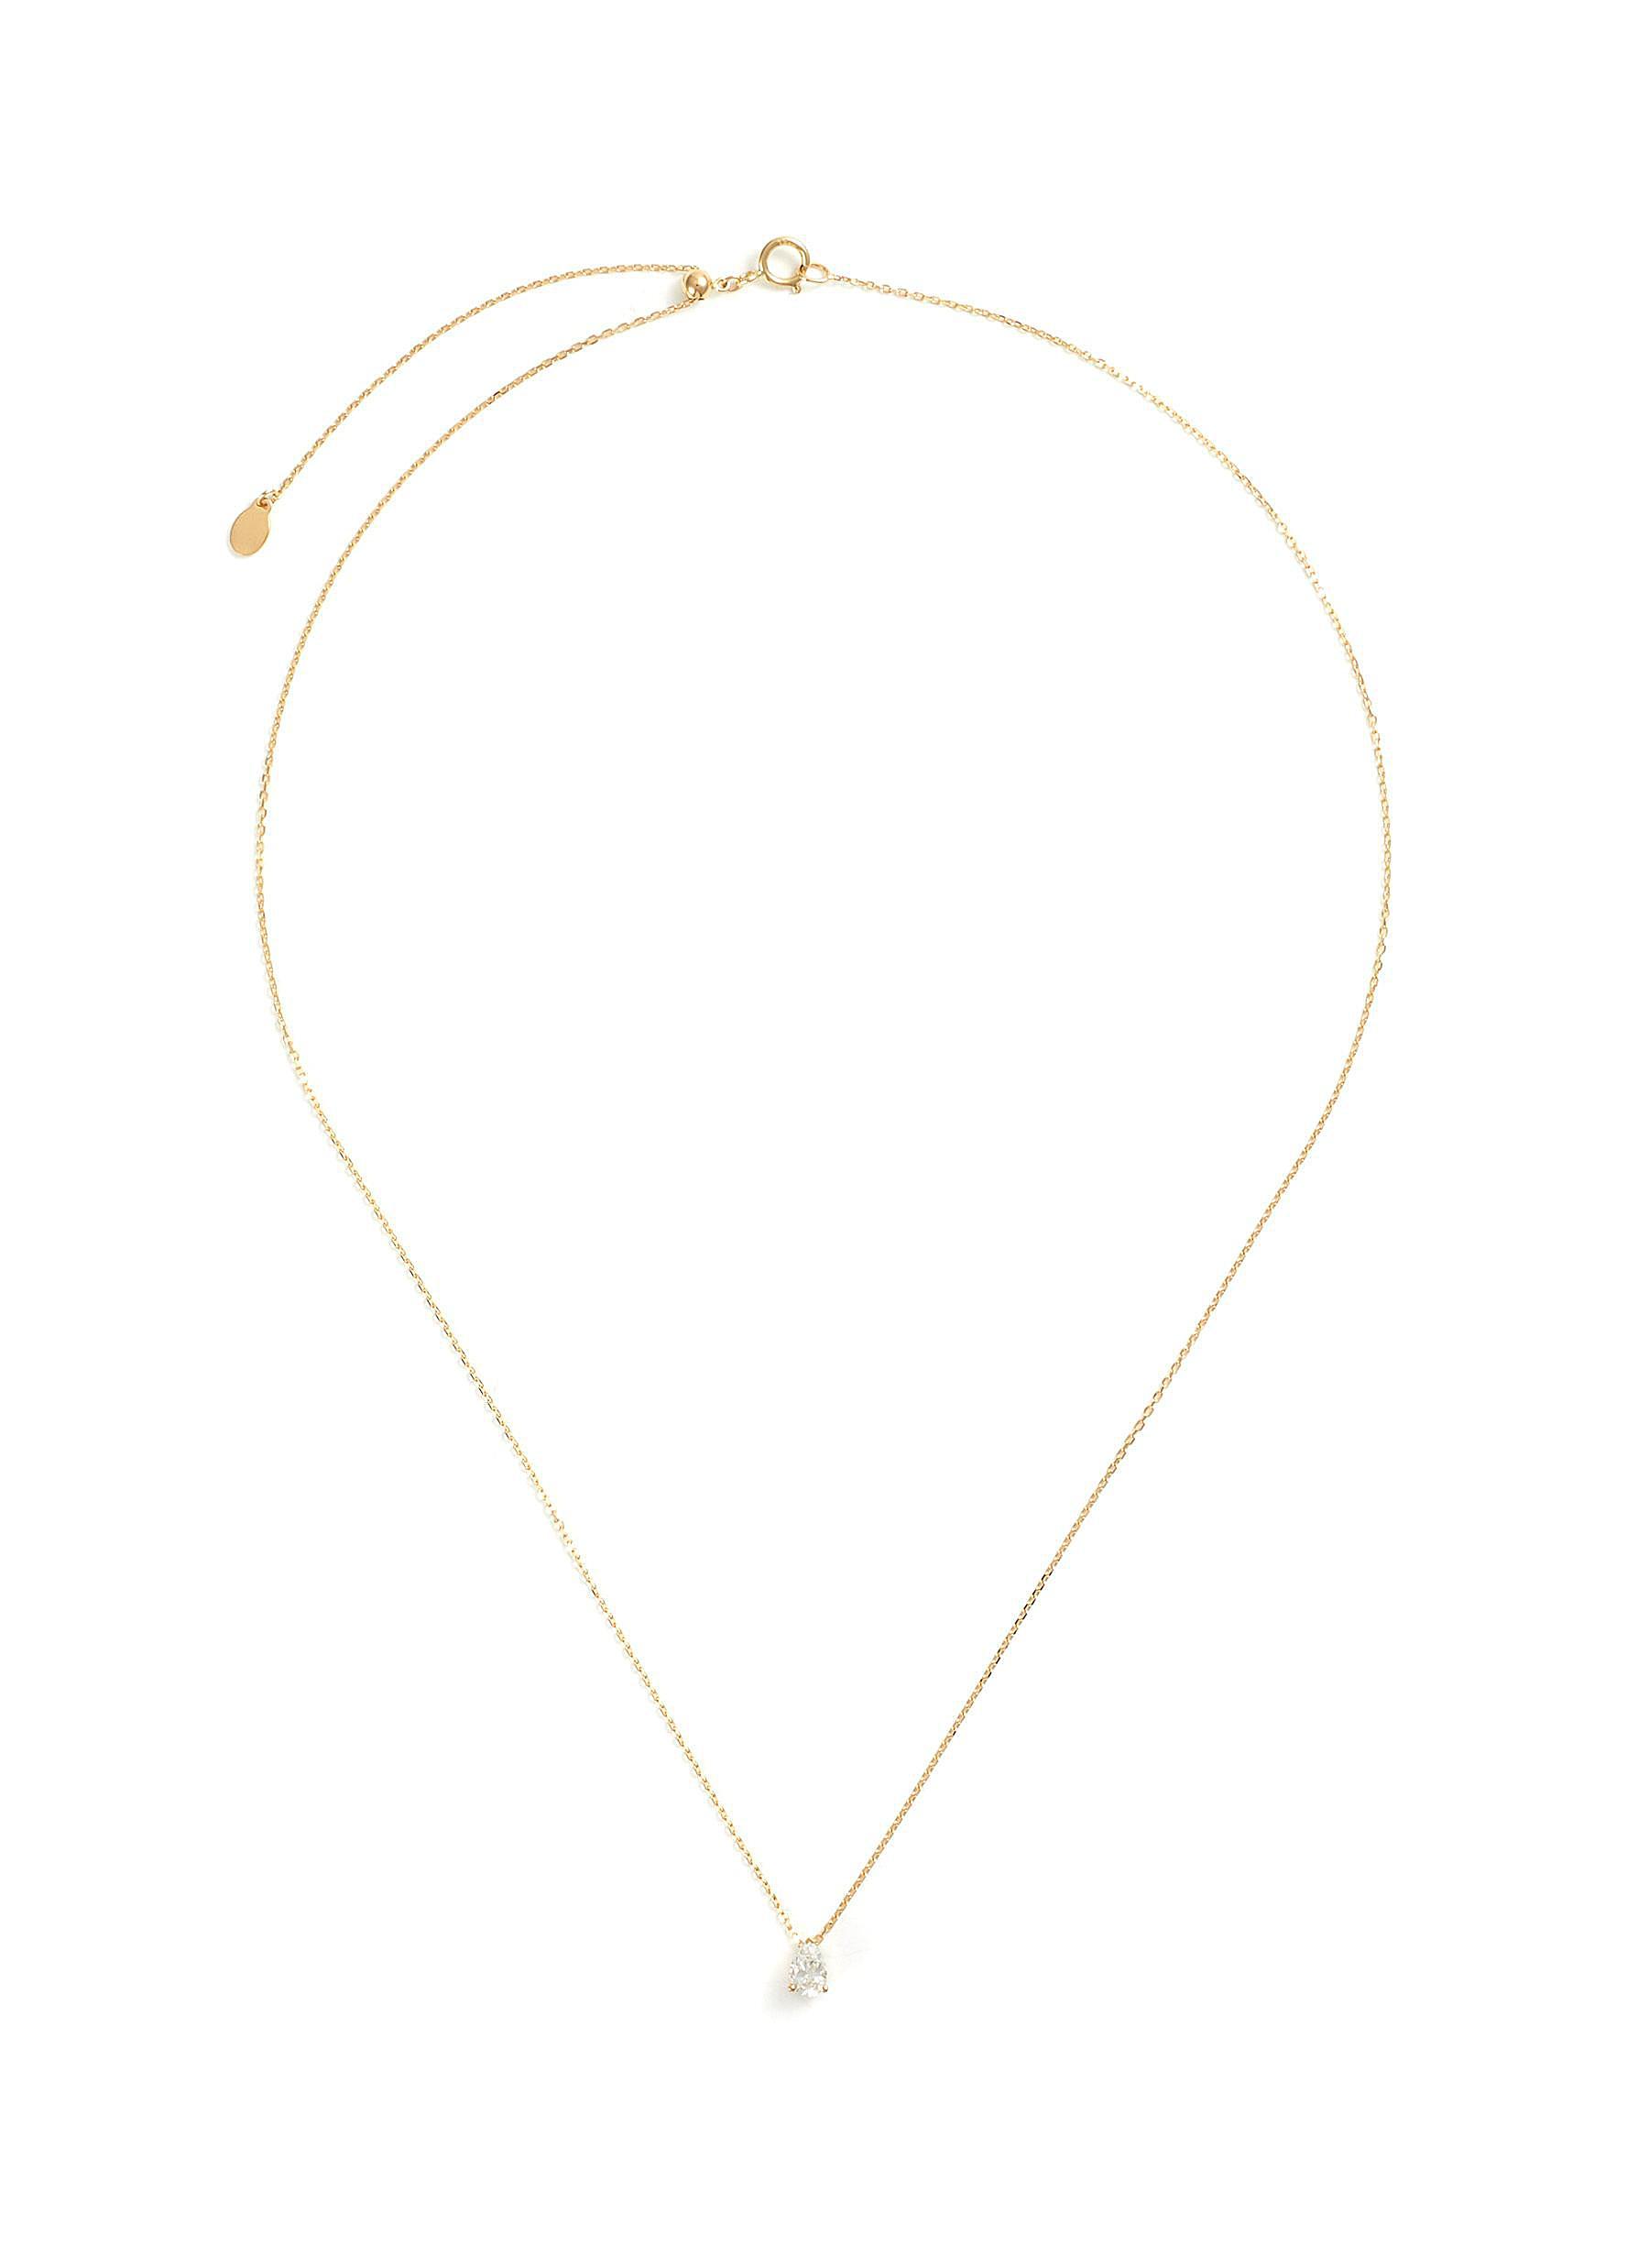 'Simone' lab grown diamond 18k gold pendant necklace